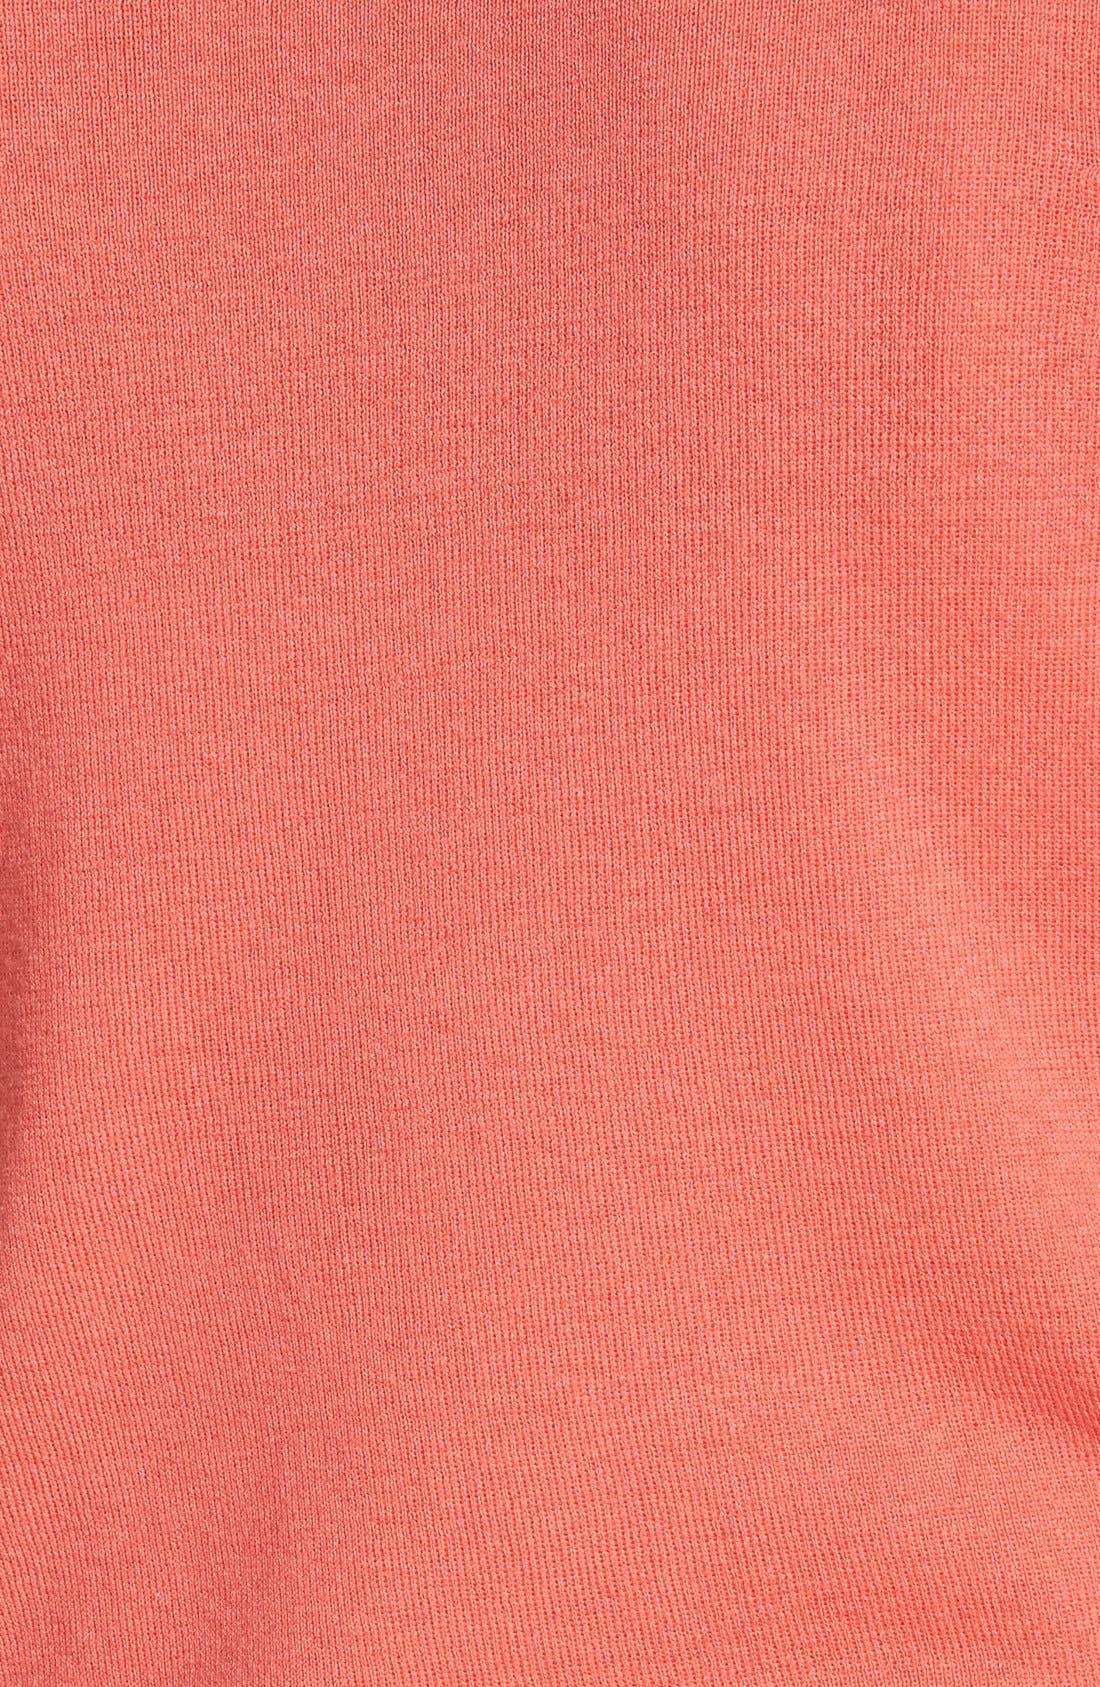 4-Way Convertible Lightweight Cardigan,                             Alternate thumbnail 411, color,